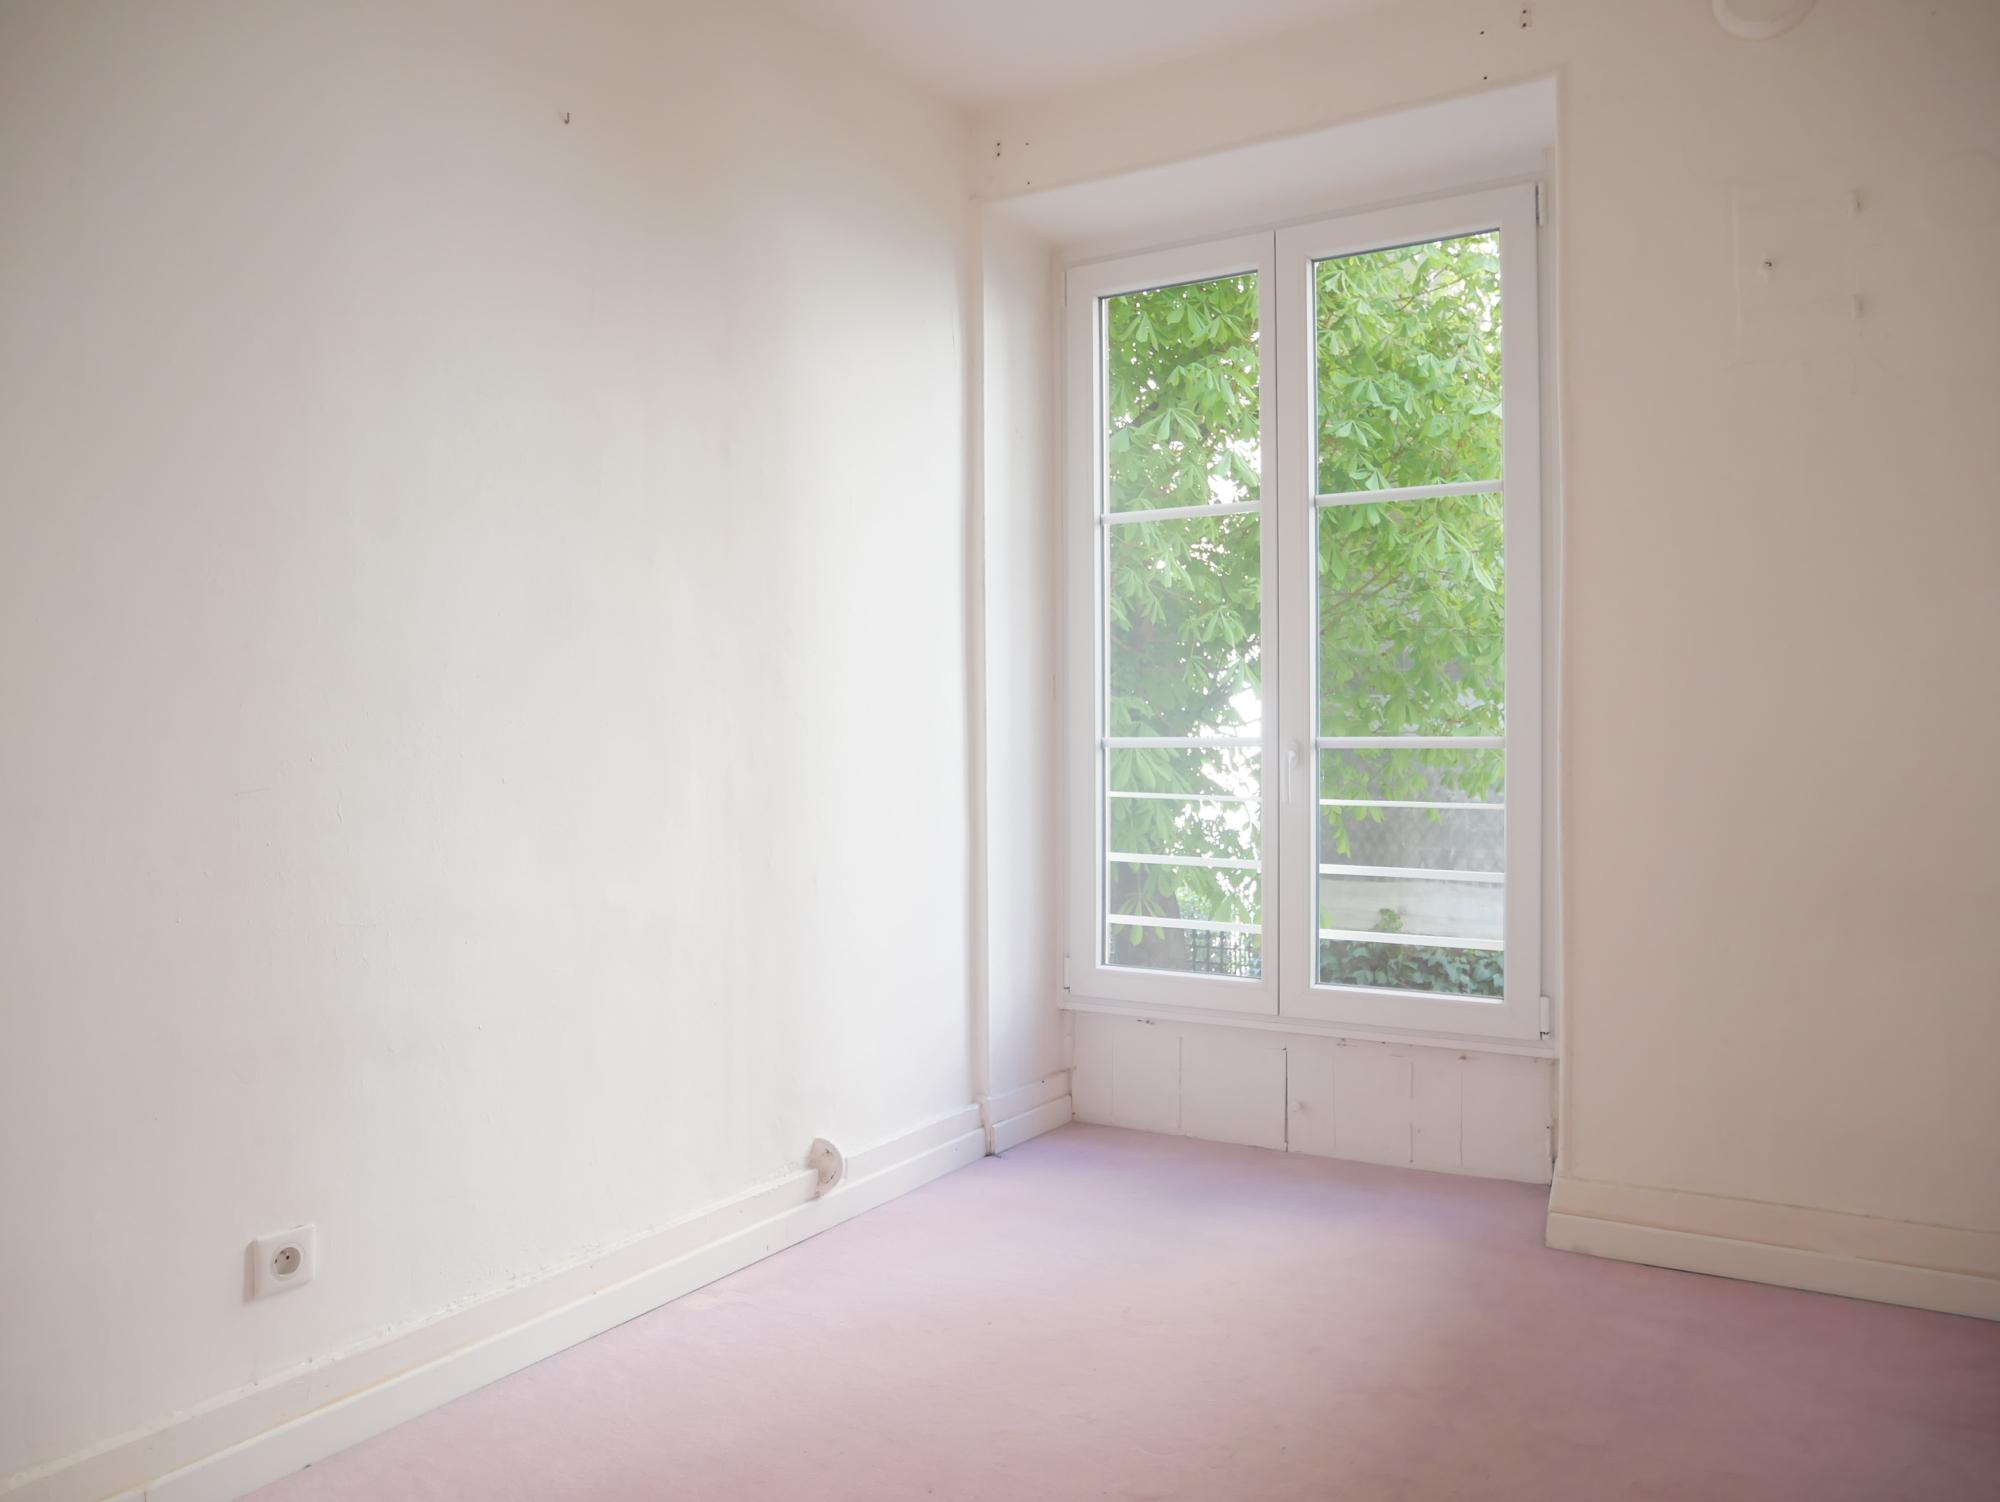 [Triomphe] Local professionnel - C.C les Halles / Quai Kléber - nos locations - Beausite Immobilier 2